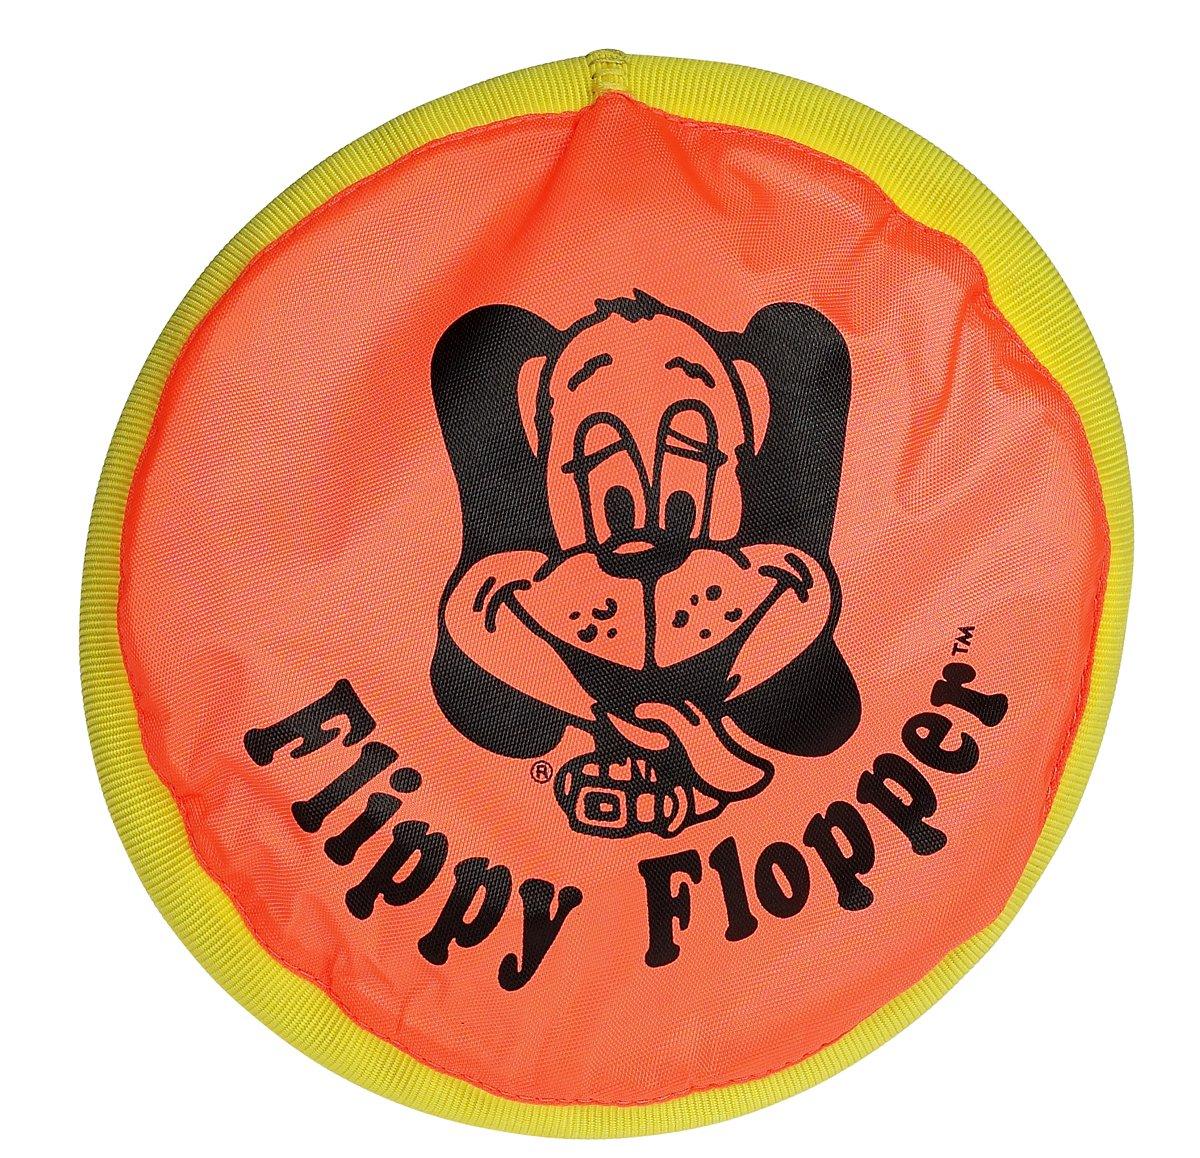 Flippy Floppy Frisbee For Dogs